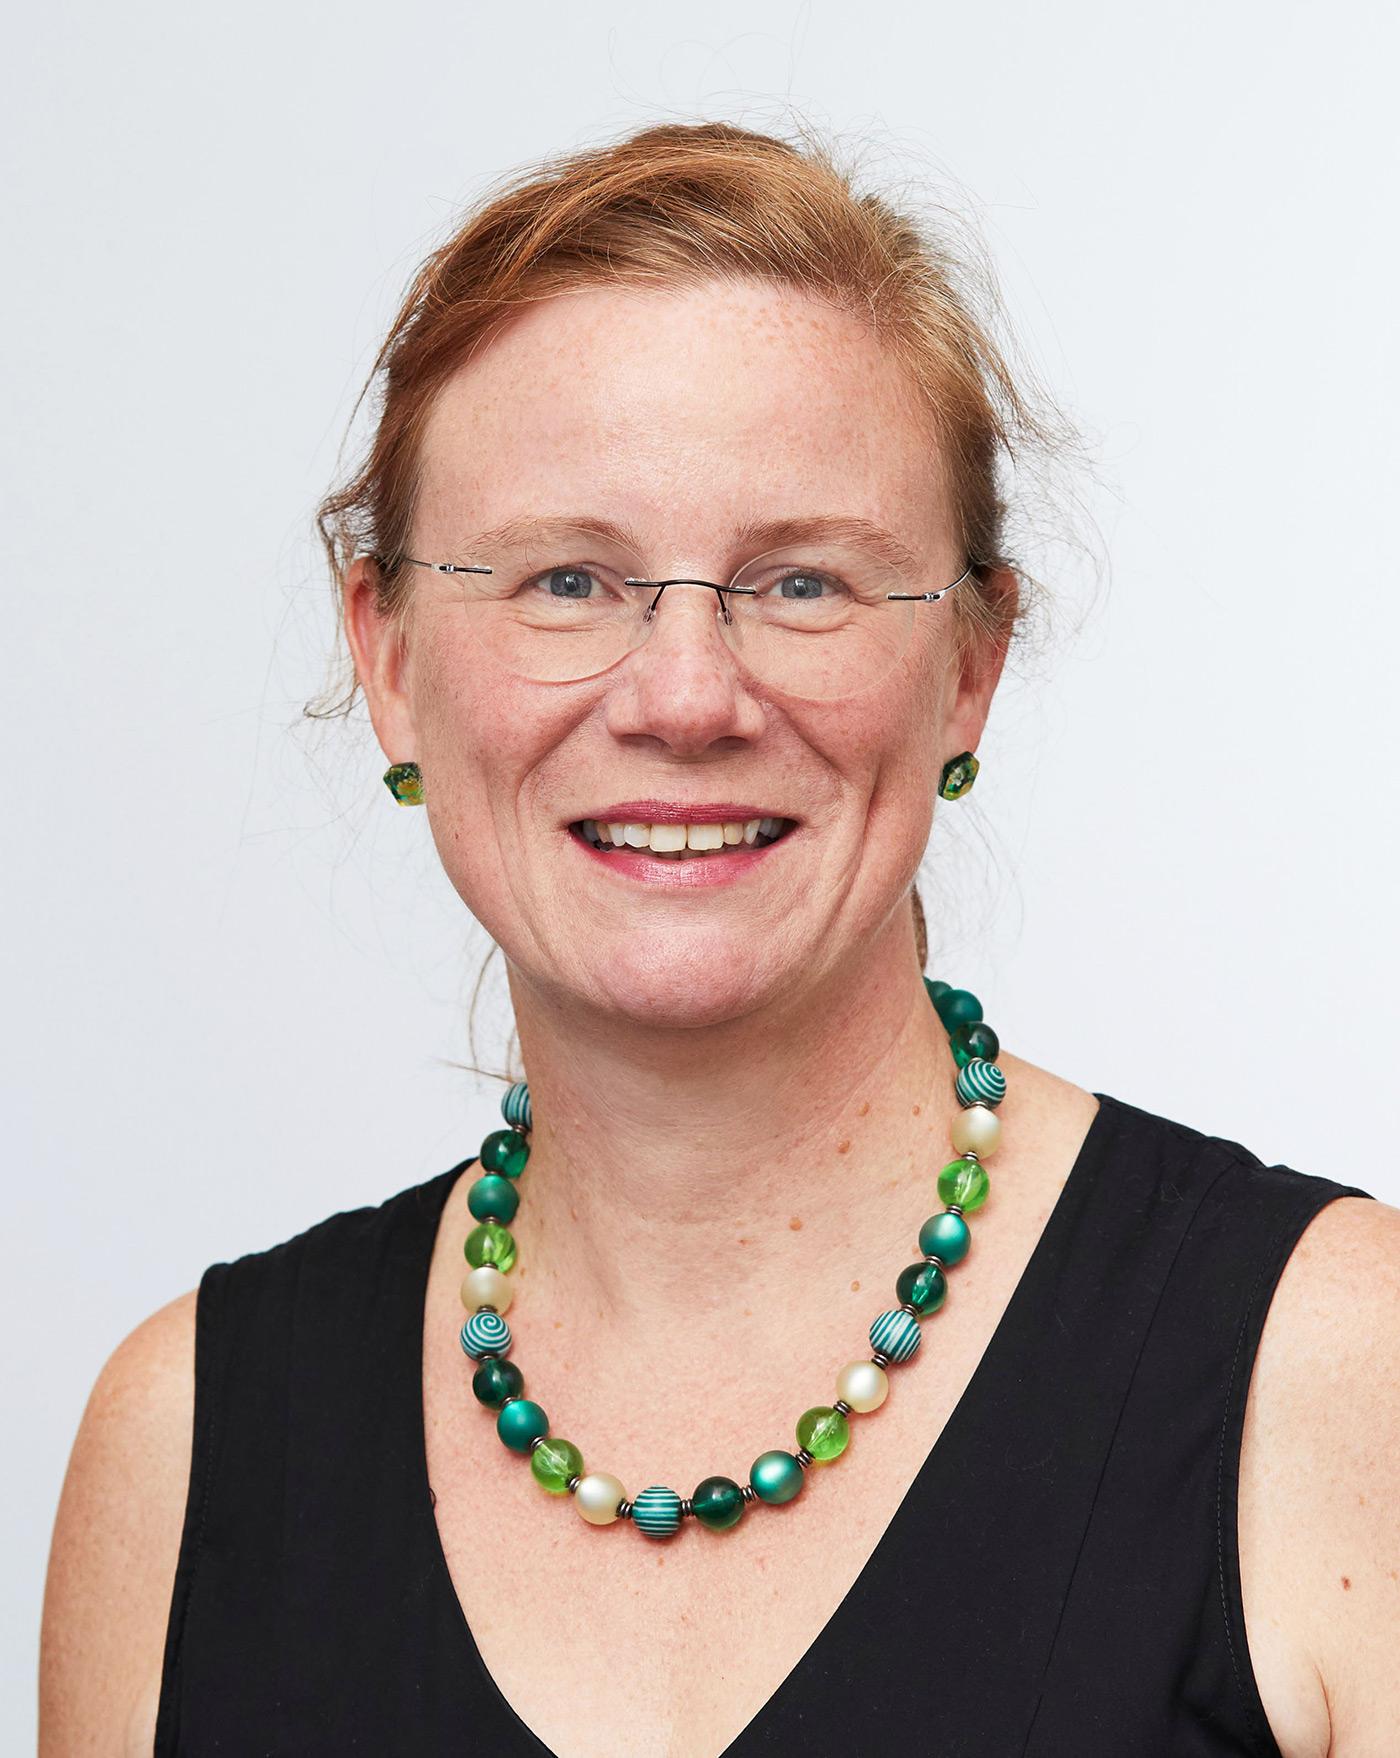 Marion Steinmeier